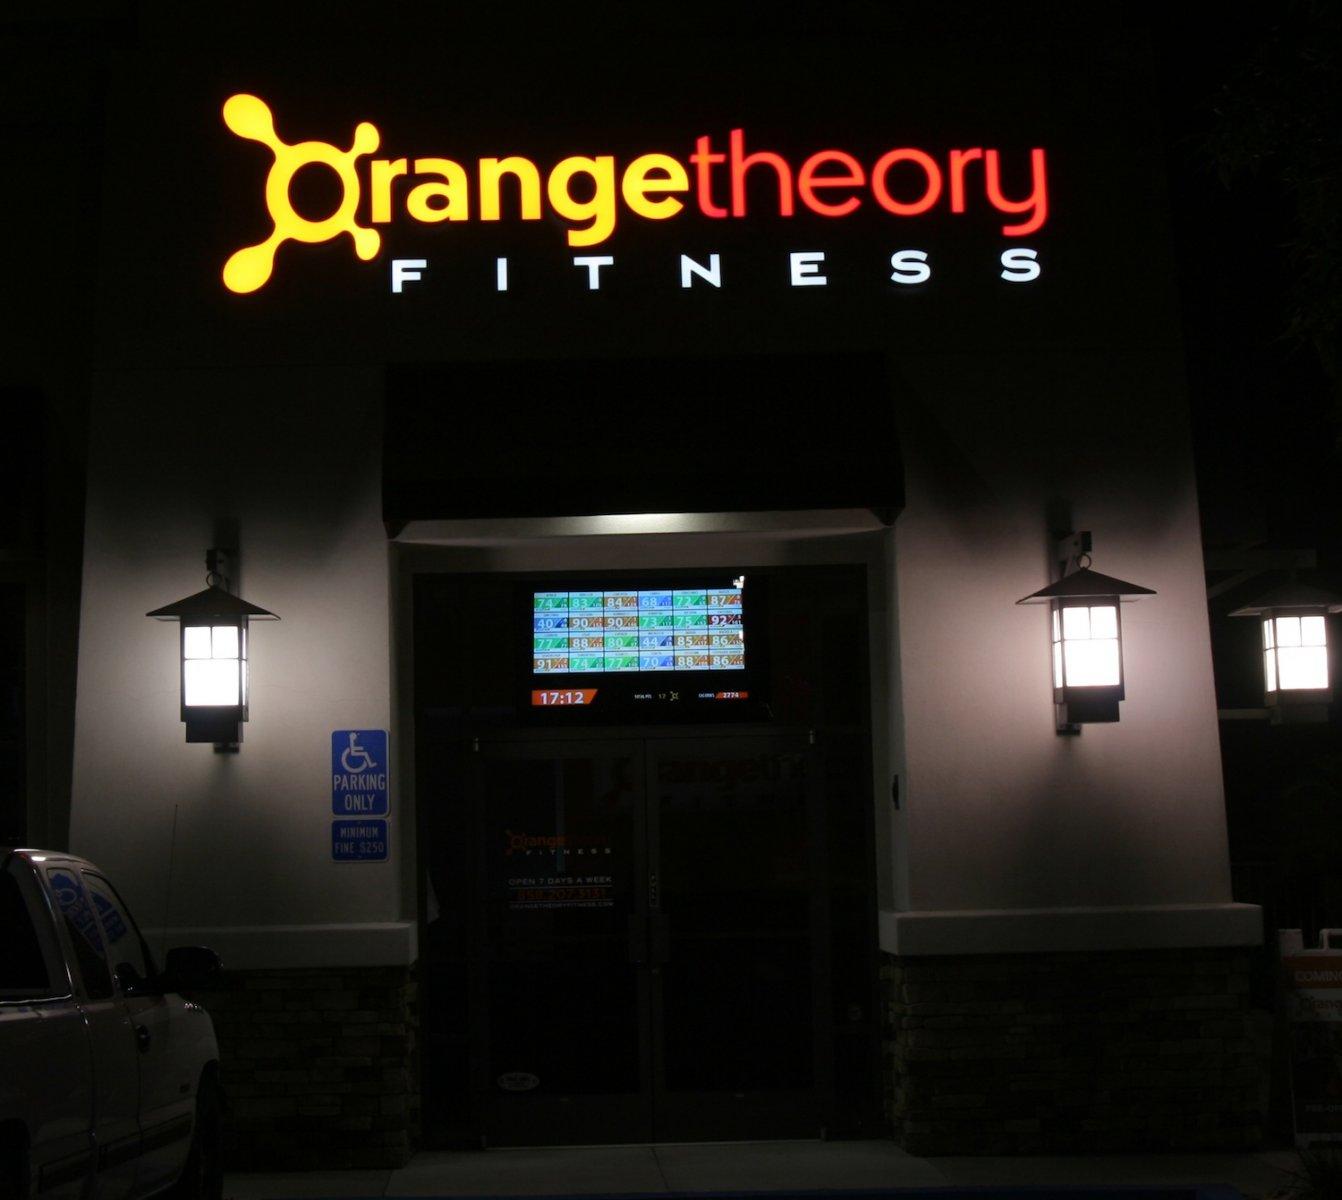 Orange Theory Fitness - Carmel Valley